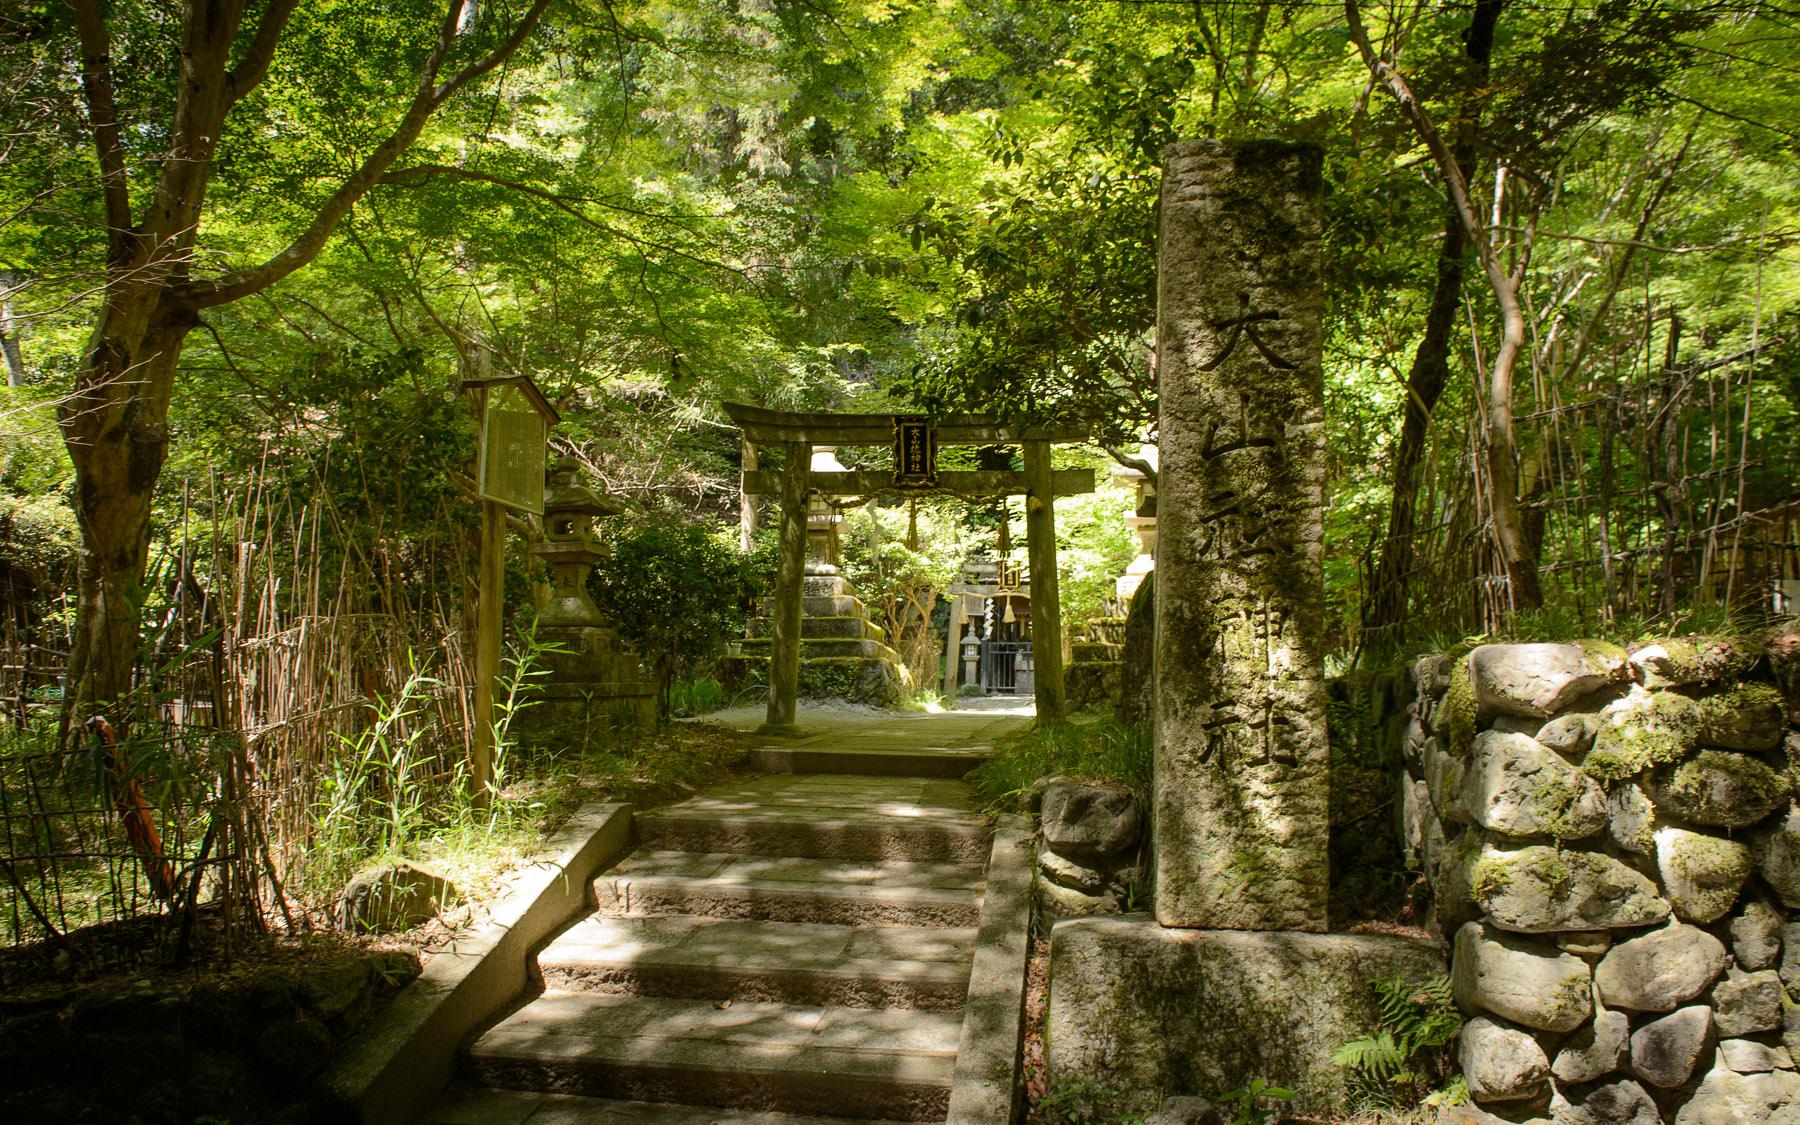 Jeffrey Friedl S Blog 187 My Mt Hiei Climb Challenge 2013 Part 1